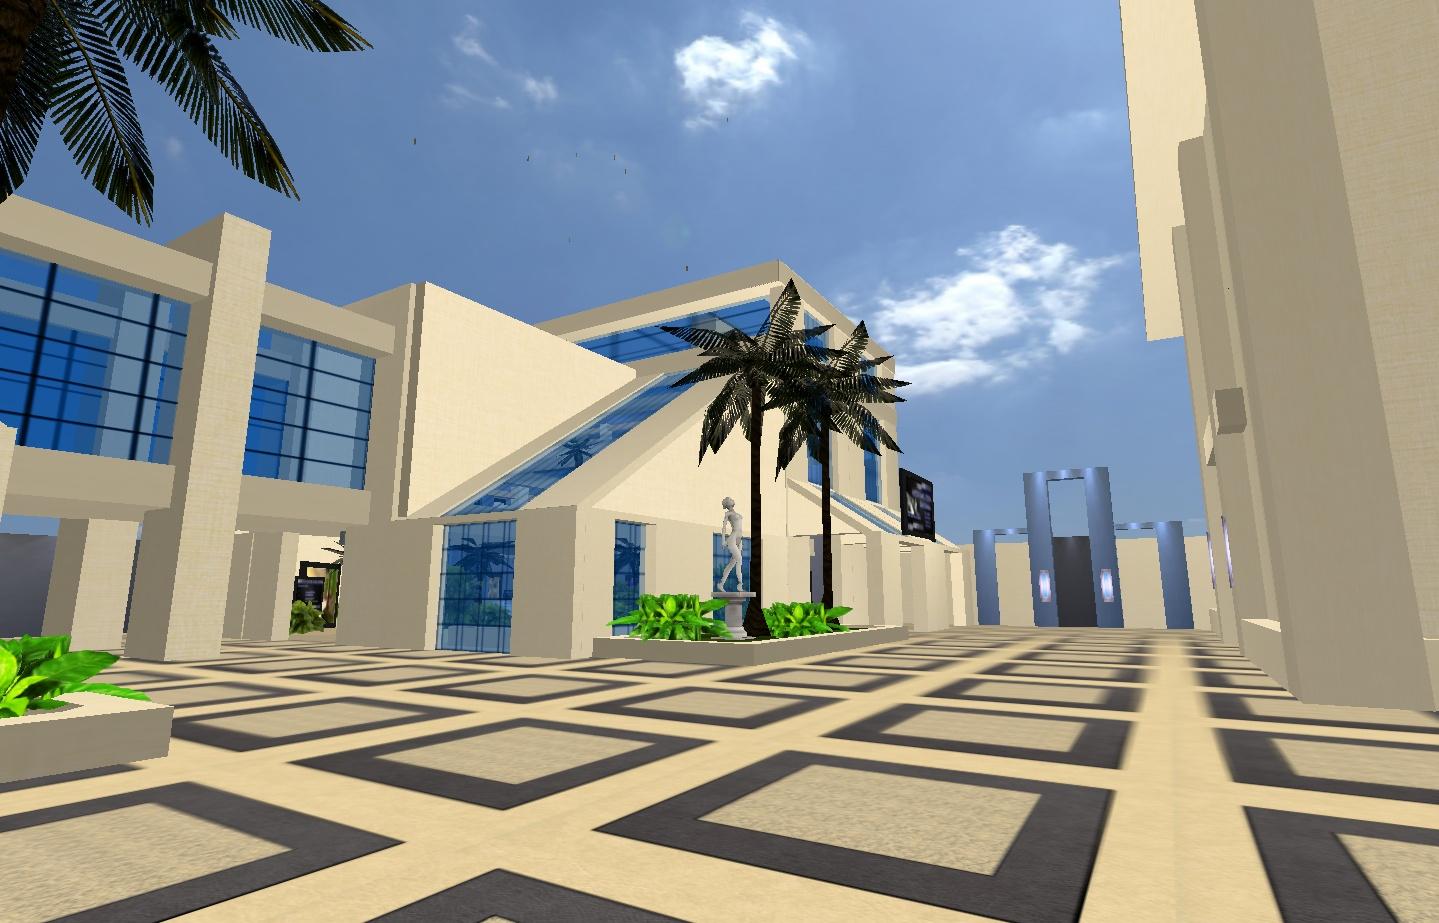 Das neue Palais de Création